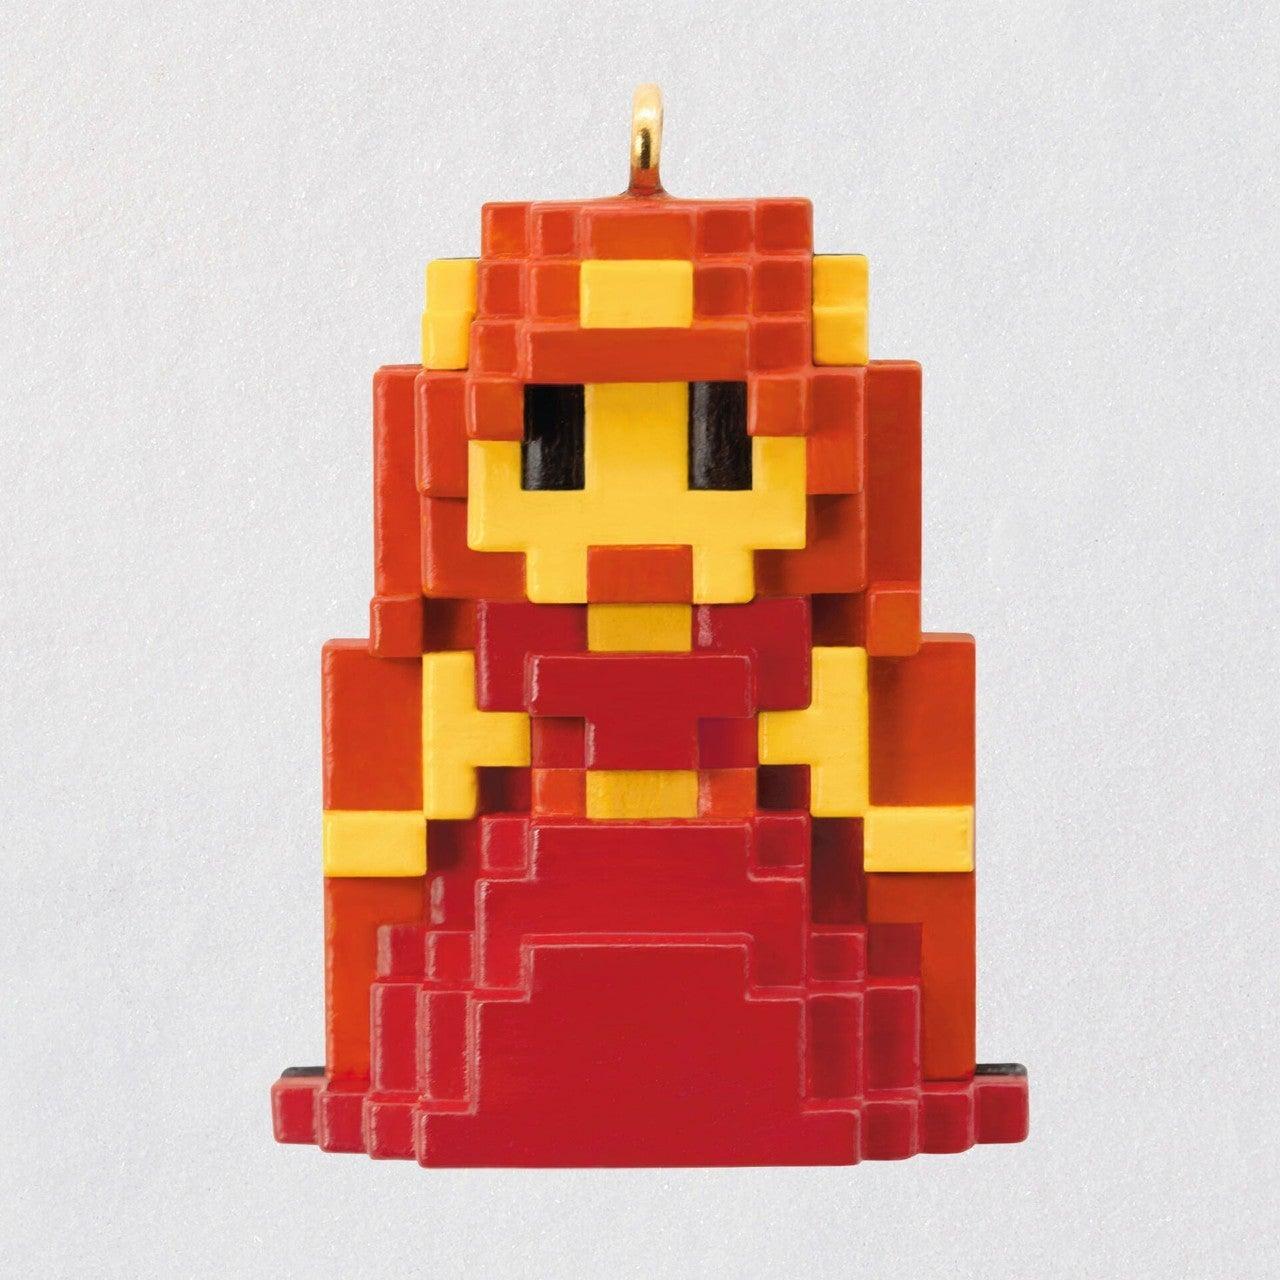 Mini-Nintendo-The-Legend-of-Zelda-Princess-Zelda-Keepsake-Ornament_899QXM8332_01